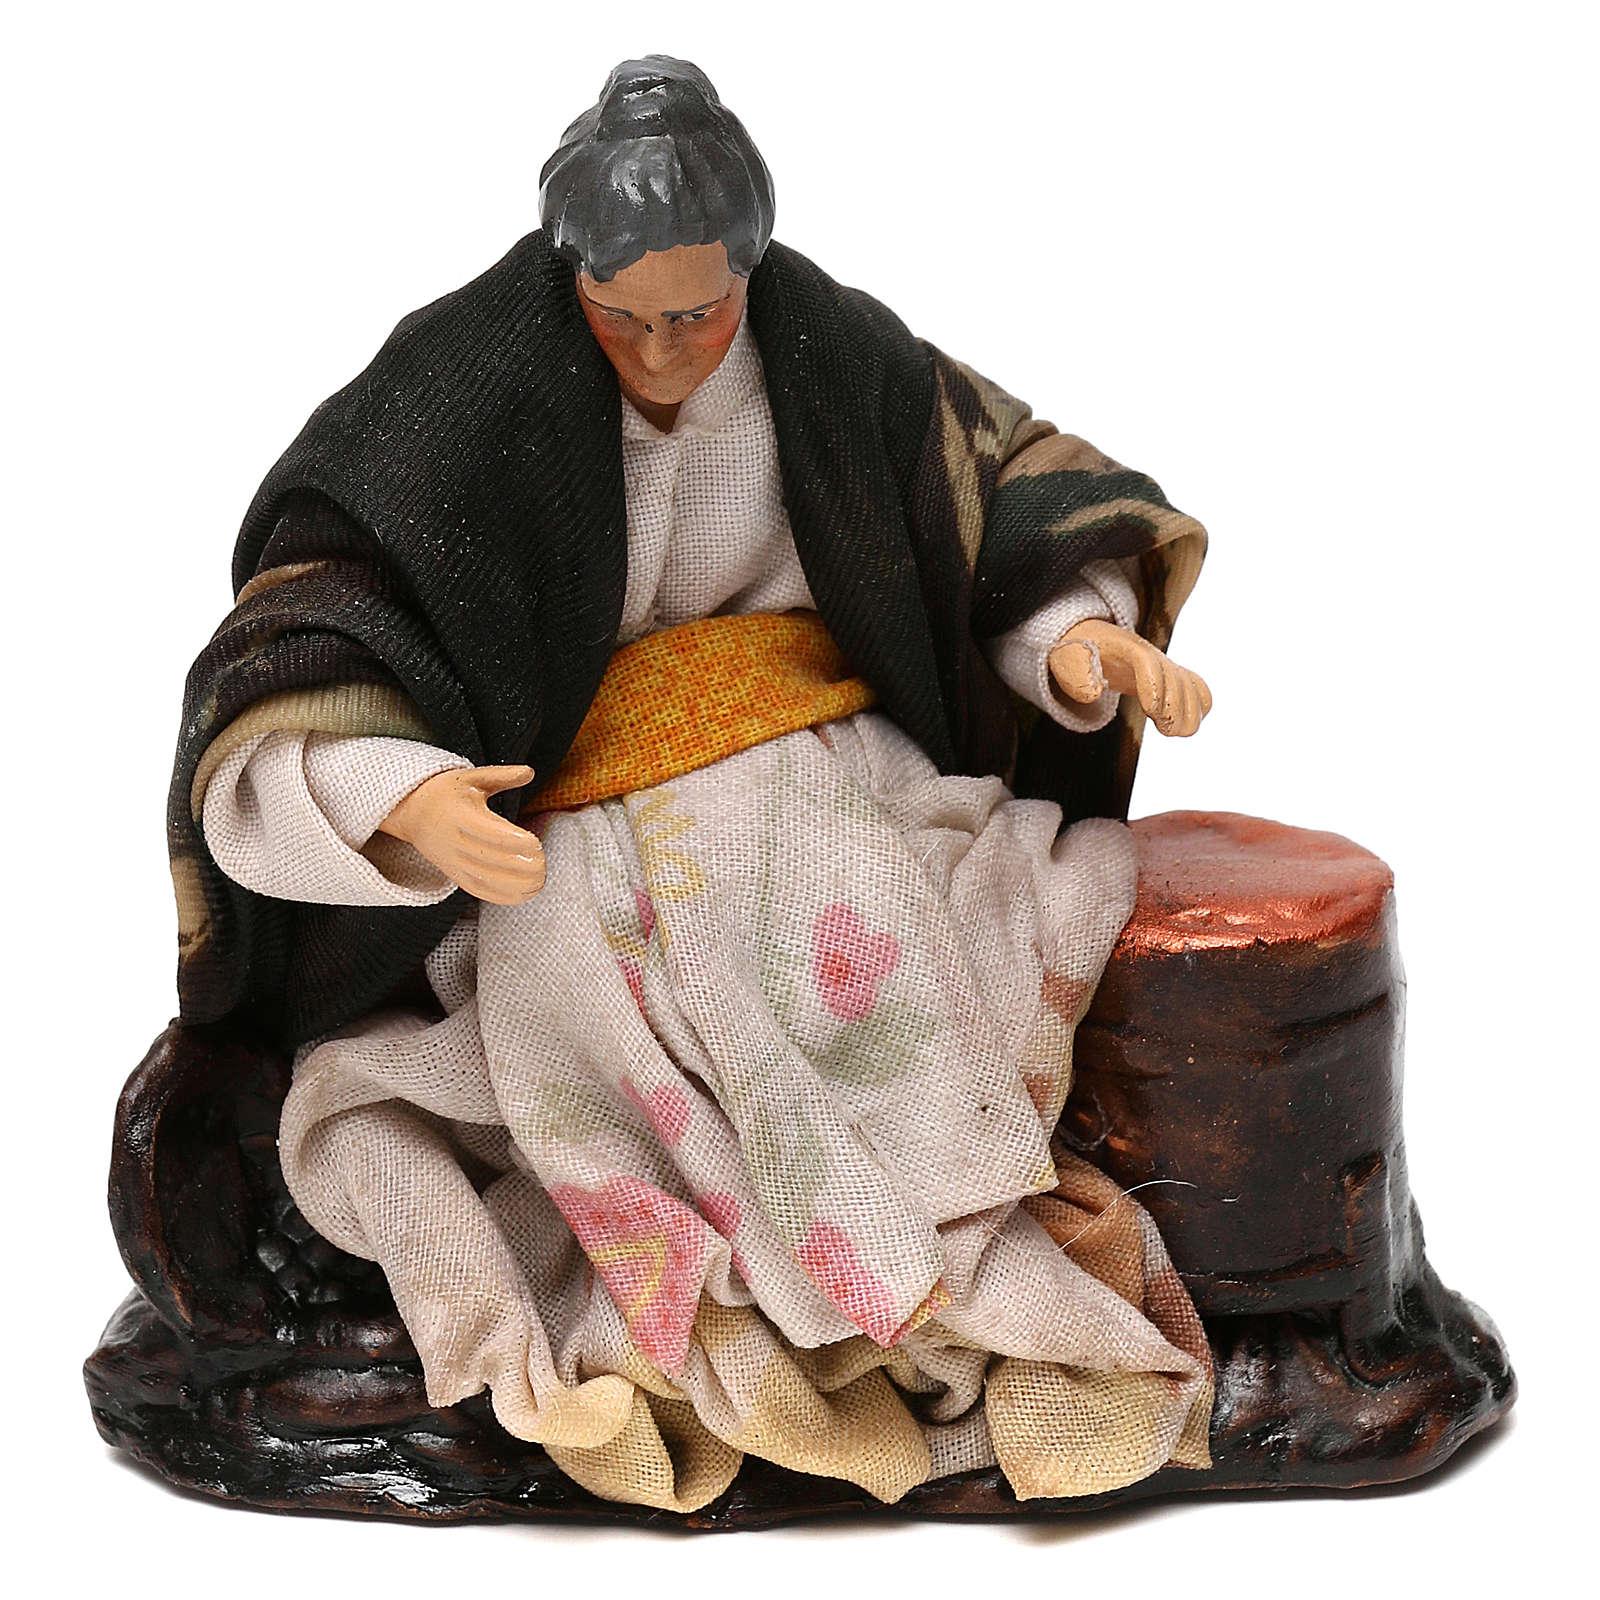 Neapolitan Nativity scene, old woman selling roast chestnuts 12 cm 4